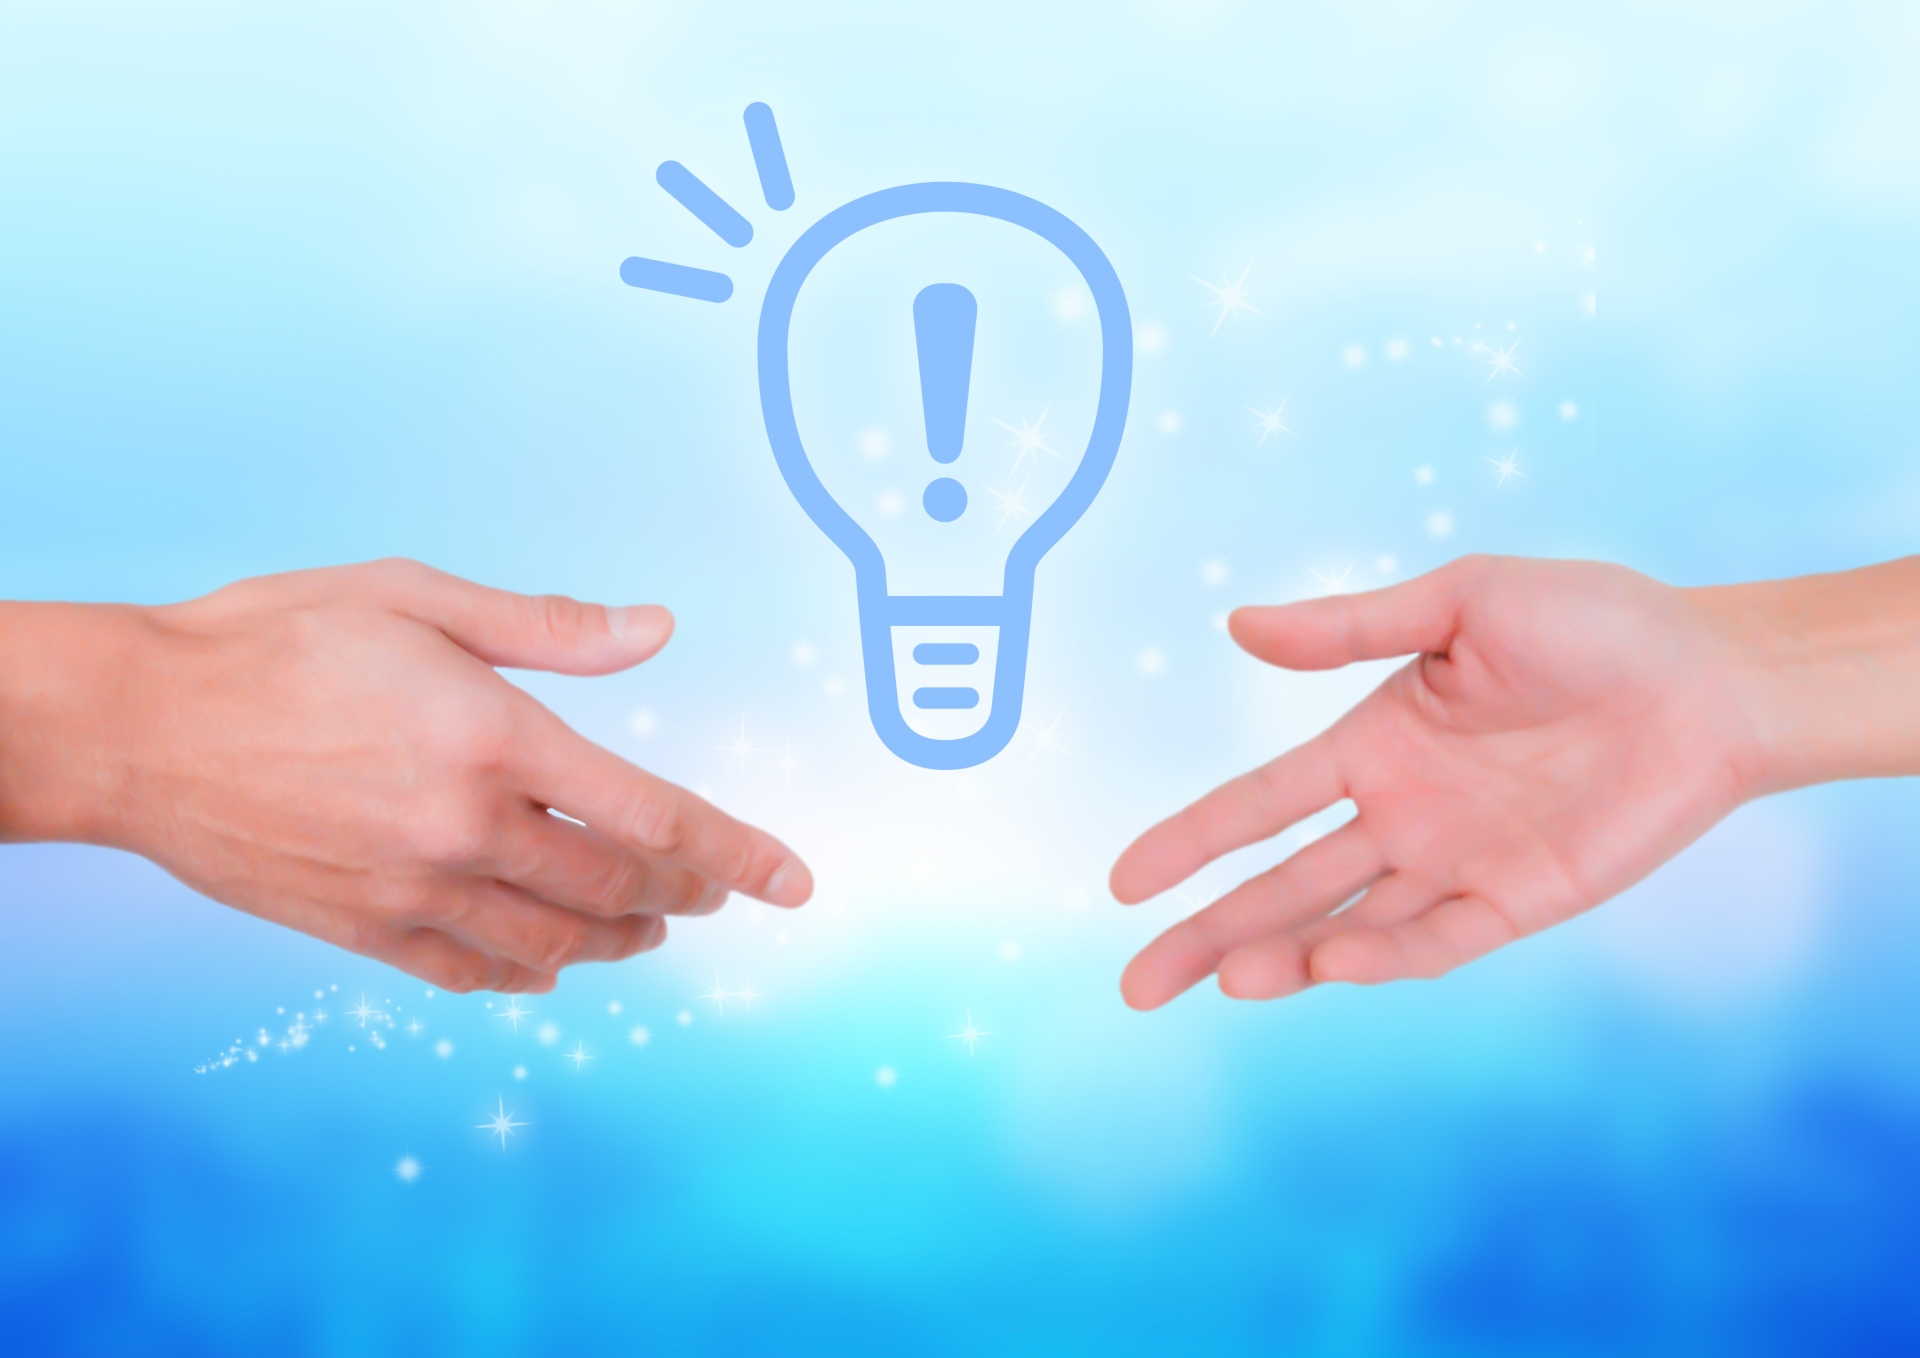 【M&A即効解決FAQ】譲渡検討企業がM&Aを成功させるために重要なポイントは?